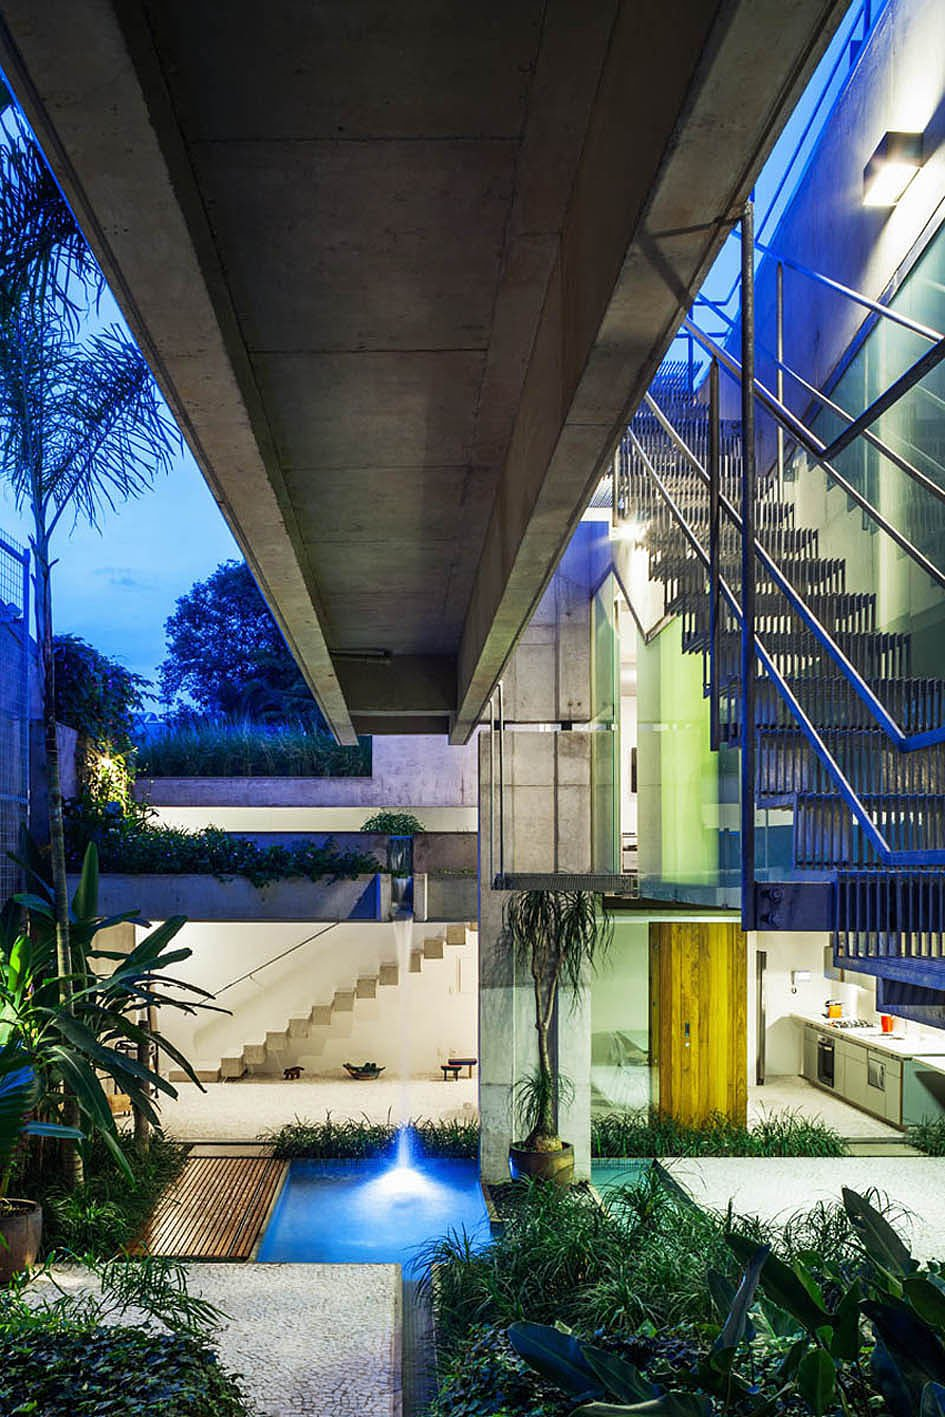 Weekend-House-in-Downtown-Sao-Paulo-19-2